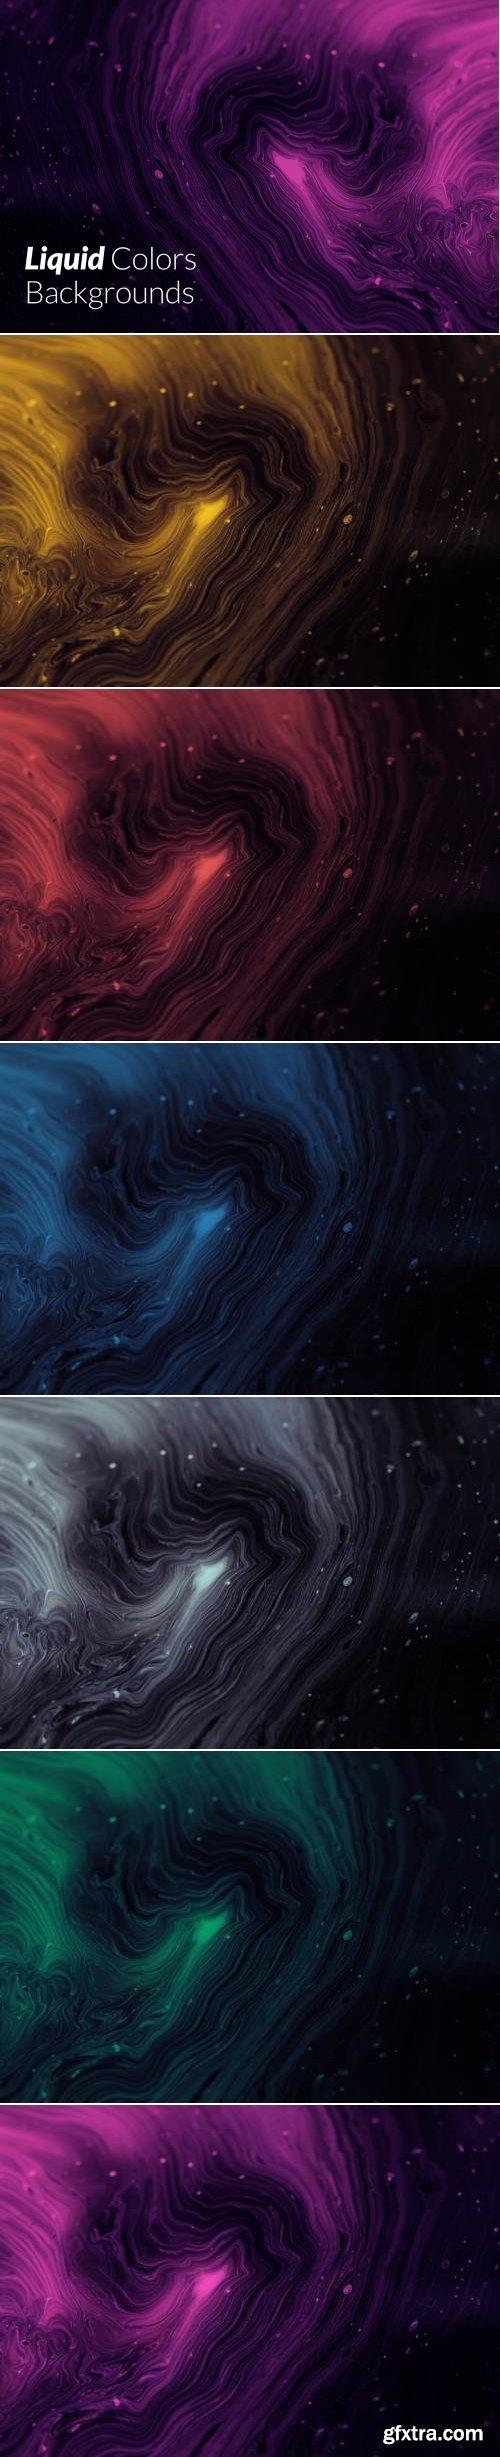 Liquid Texture Backgrounds